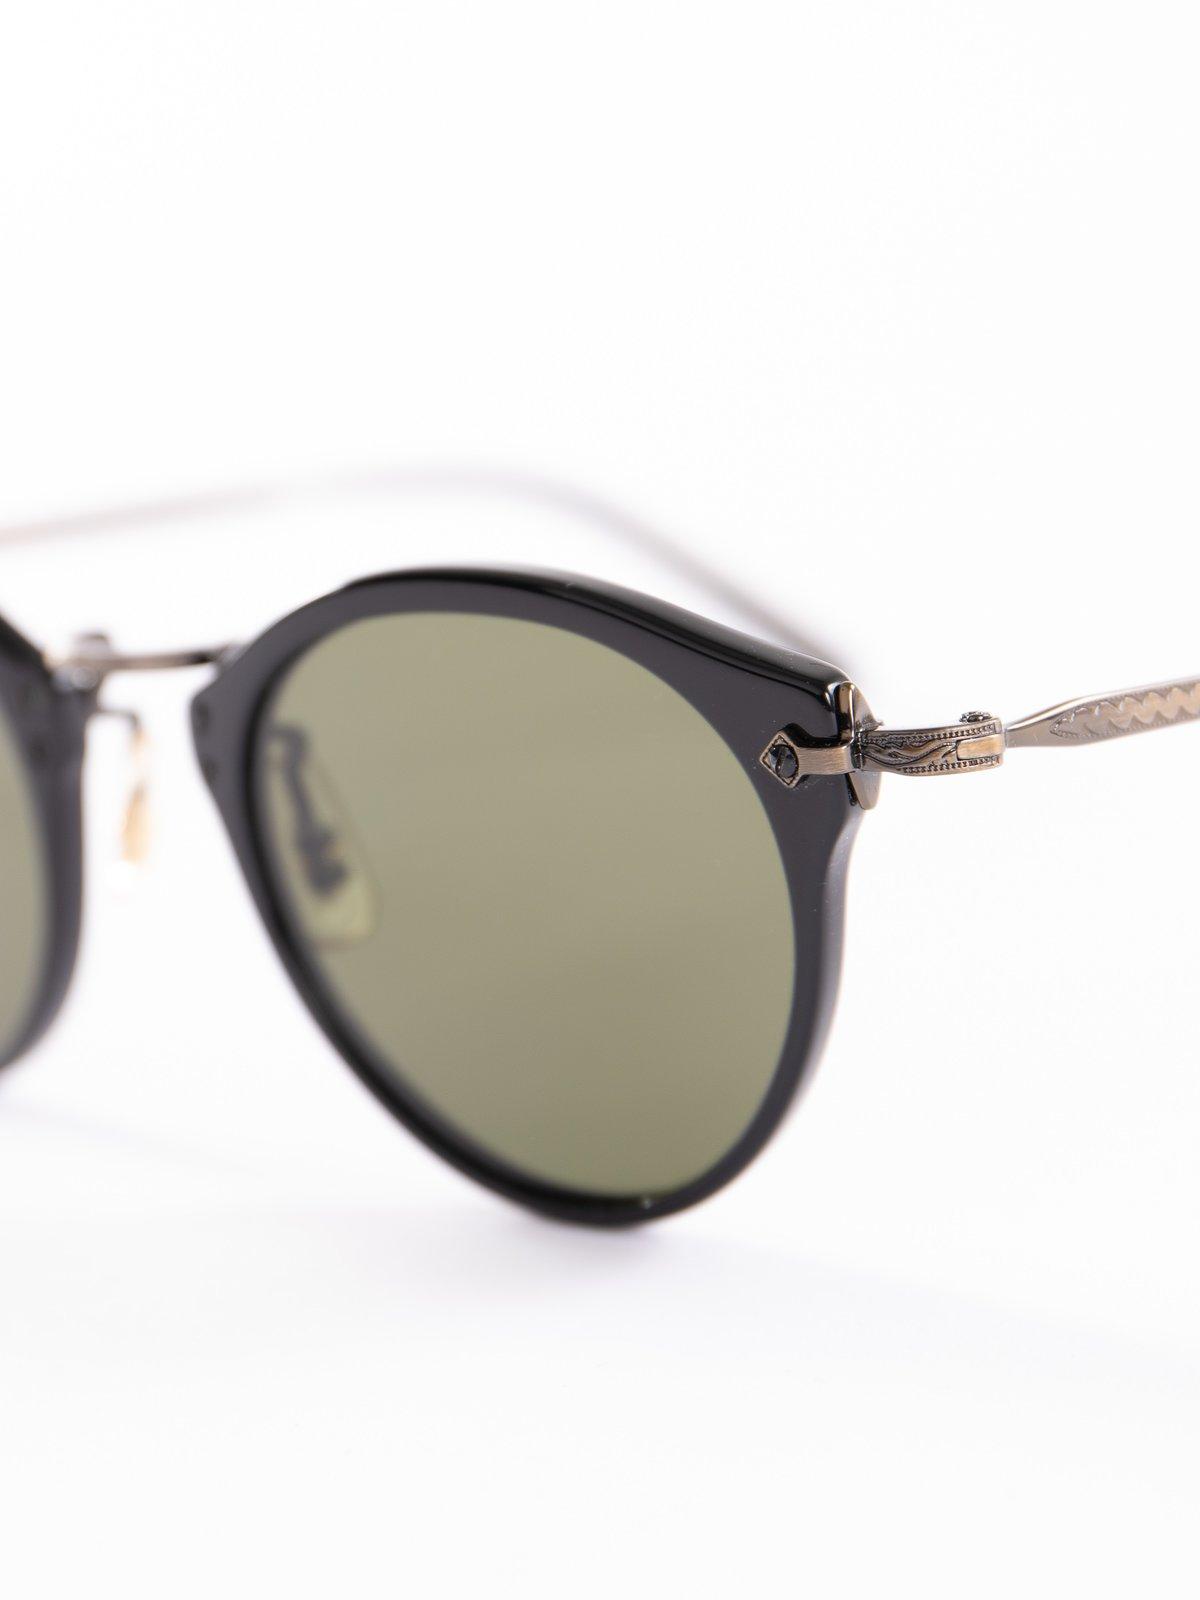 Black–Antique Gold/Green OP–505 Sunglasses - Image 3